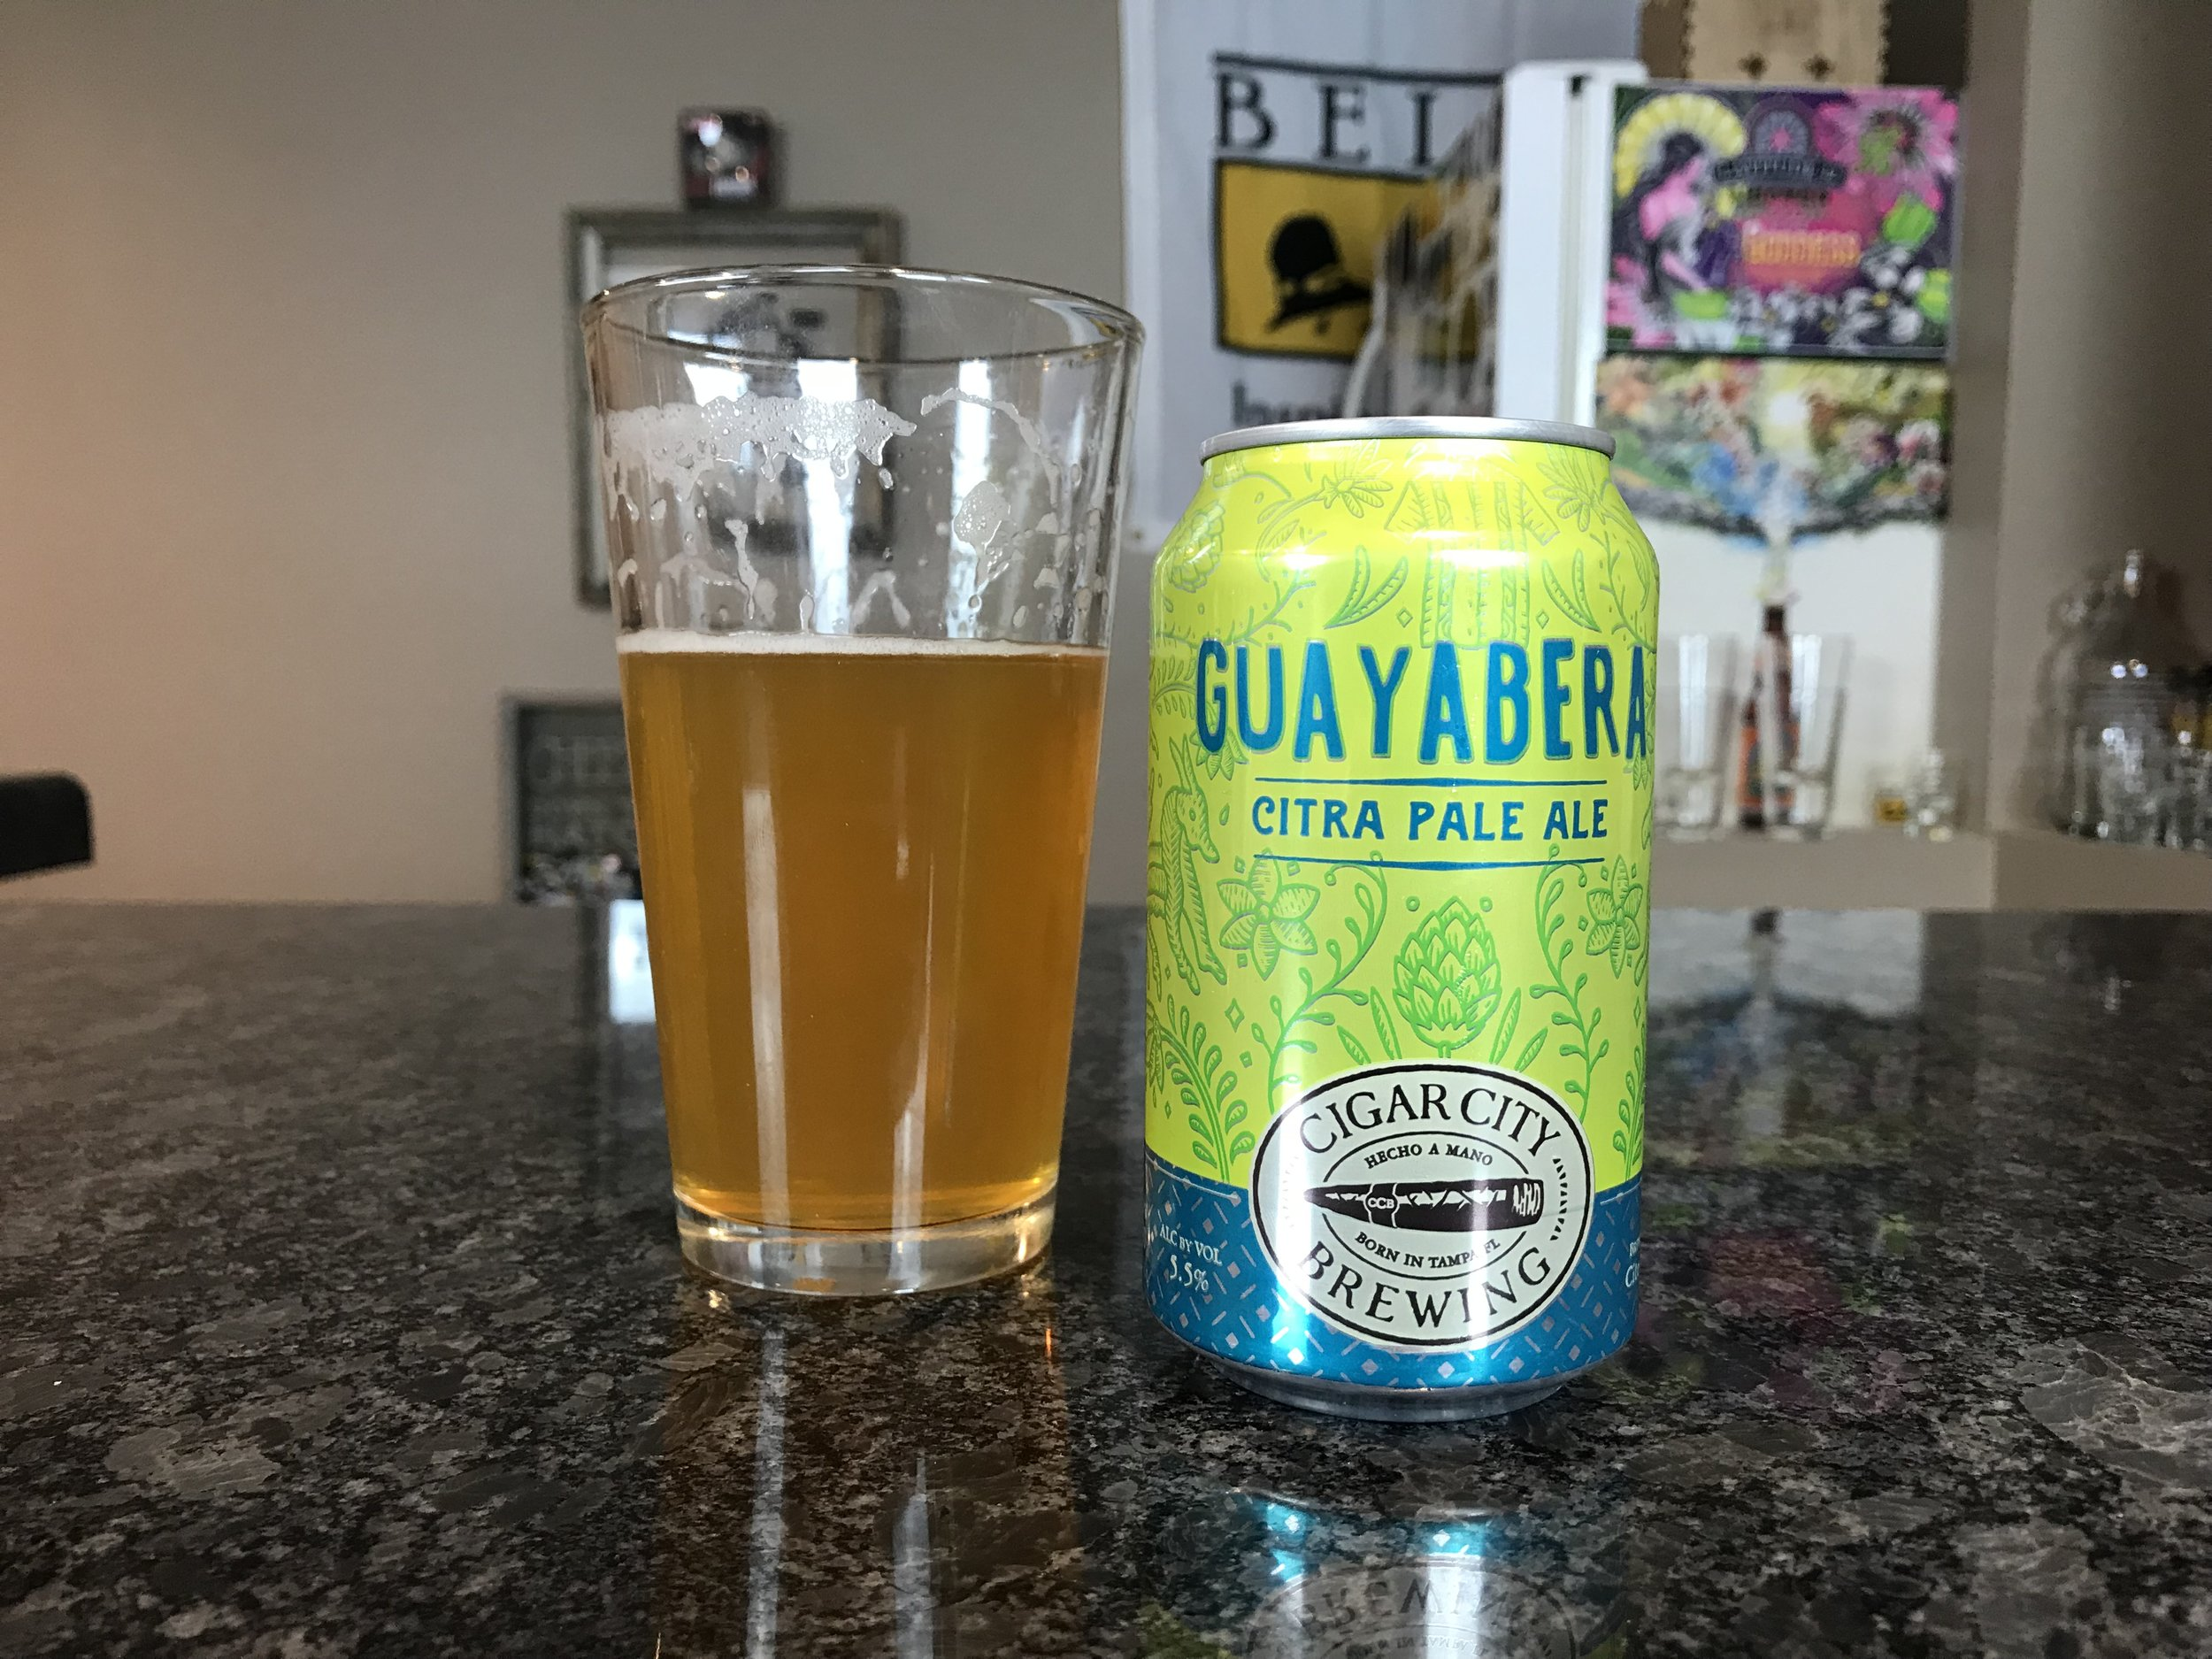 Guayabera   5.5% ABV 50 IBUs